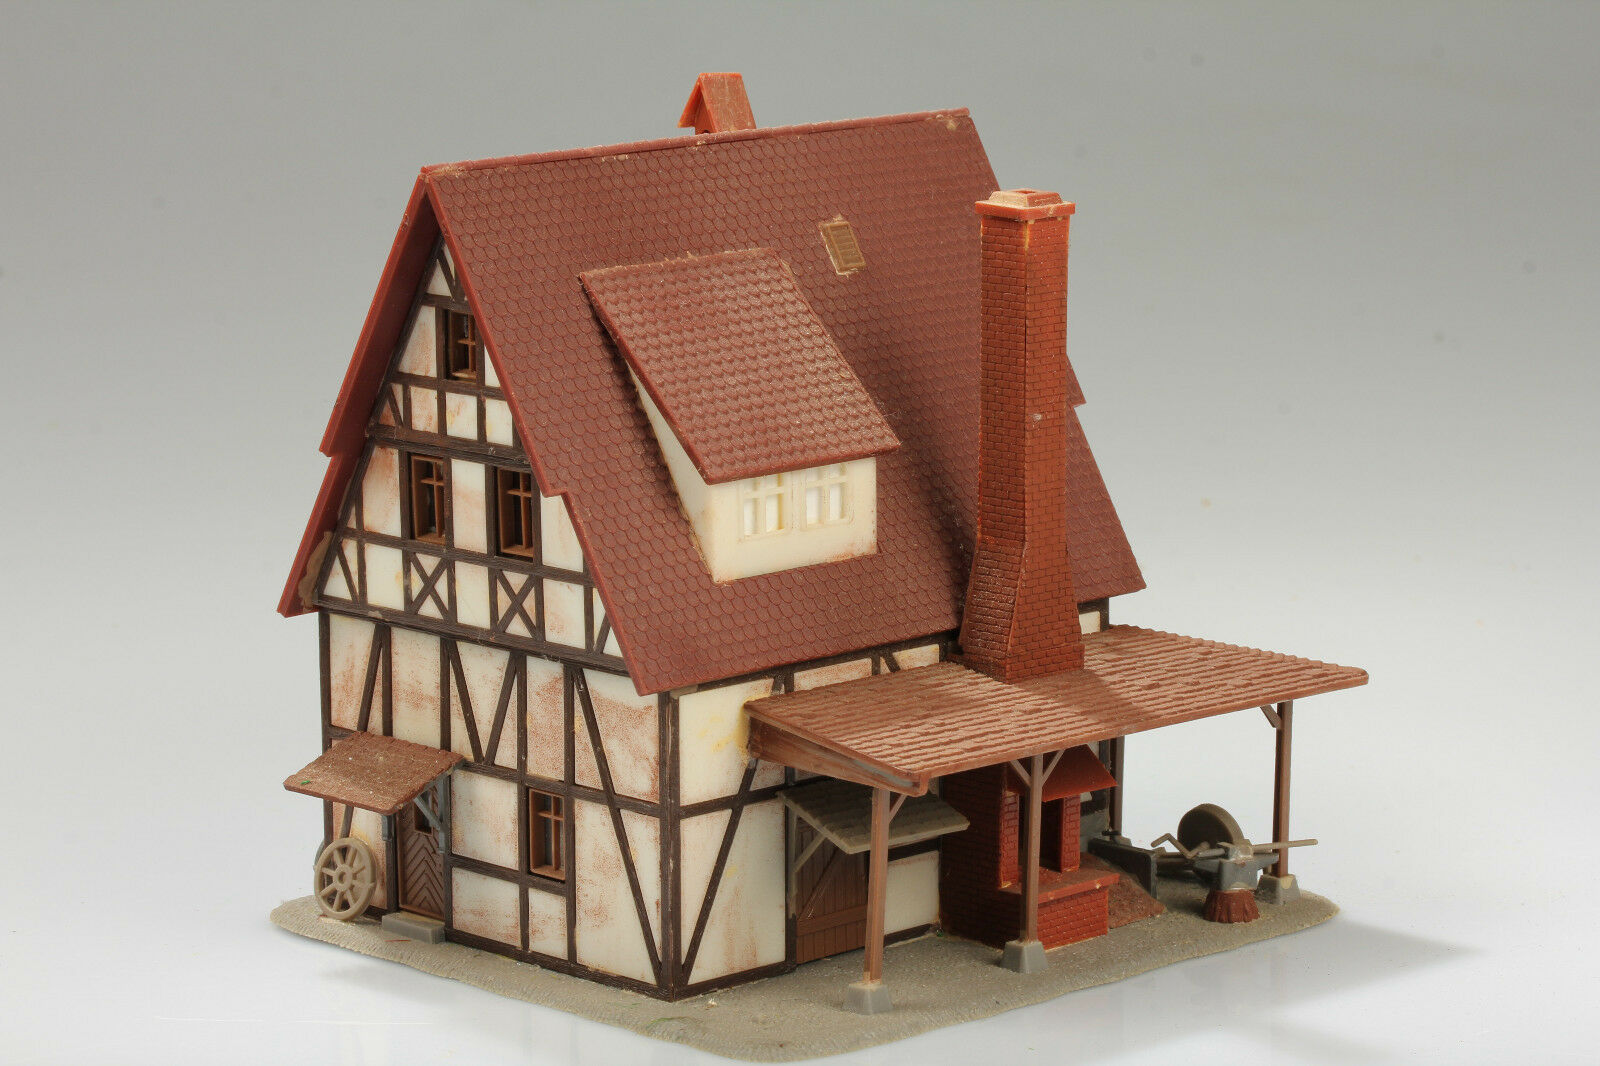 H0 Pretty Craftsman Timber Frame House Forge Dirt  Scratches Klebemängel